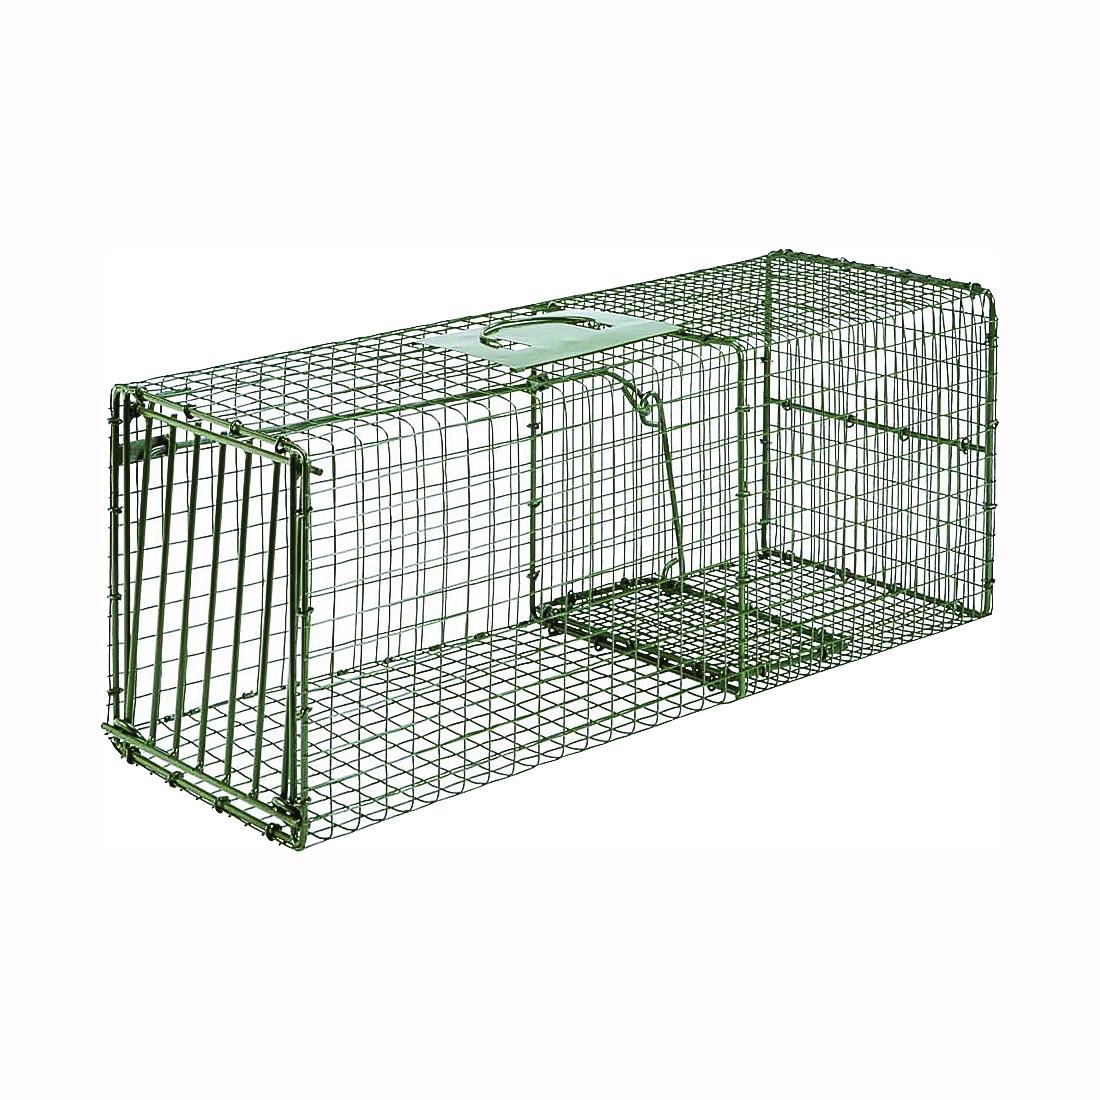 Picture of DUKE TRAPS 1112 Cage Trap, 30 in L, 12 in W, 12 in H